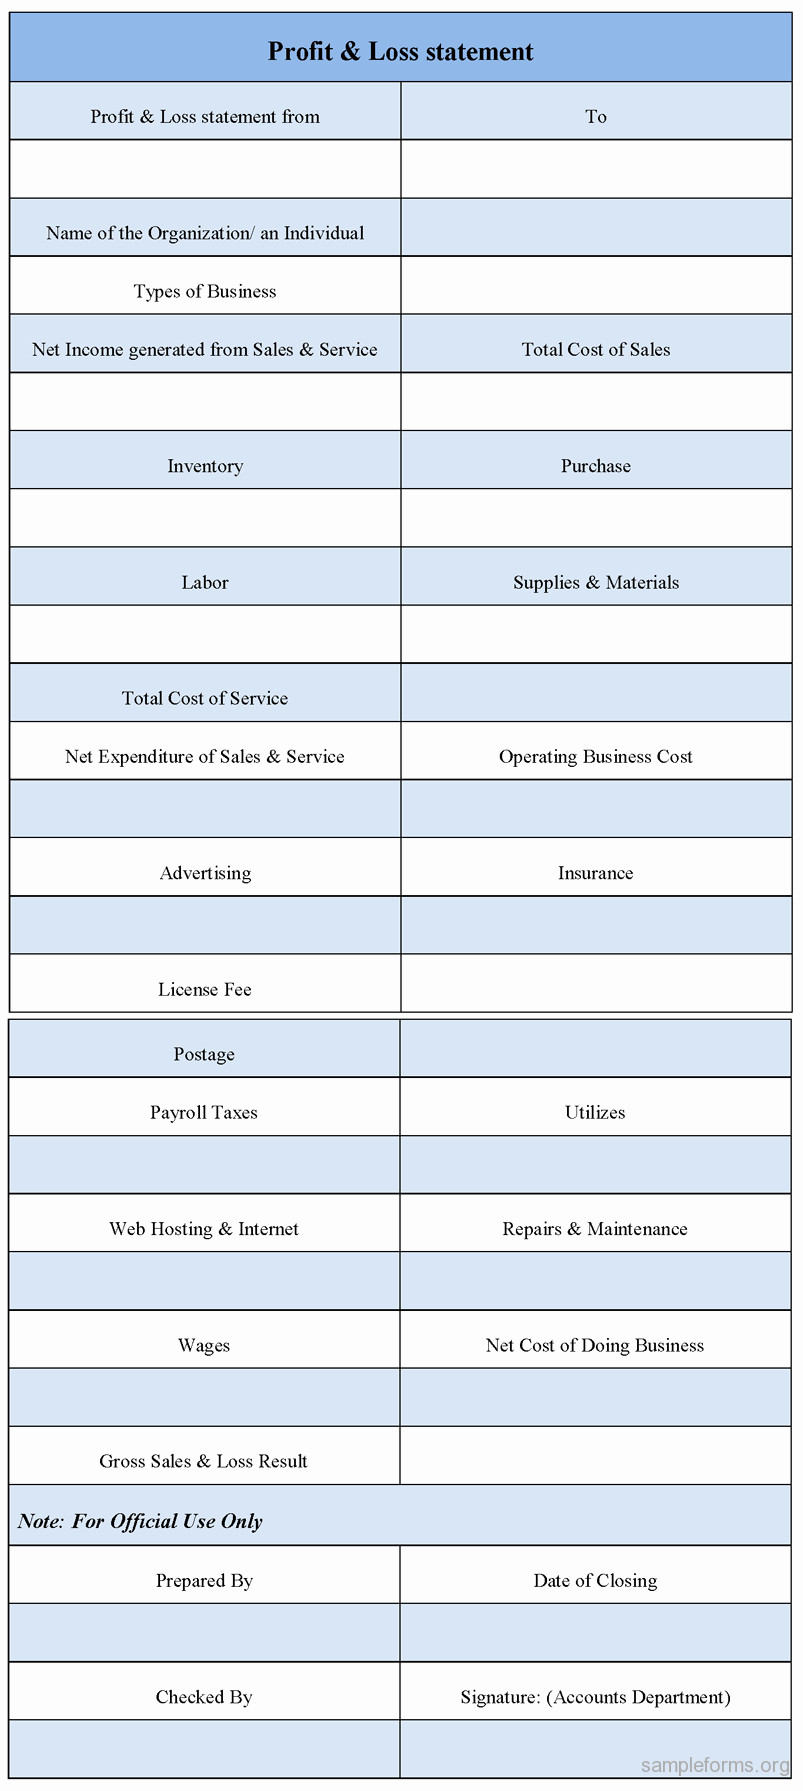 Profit and Loss Statement form Best Of Profit and Loss Statement form Sample forms